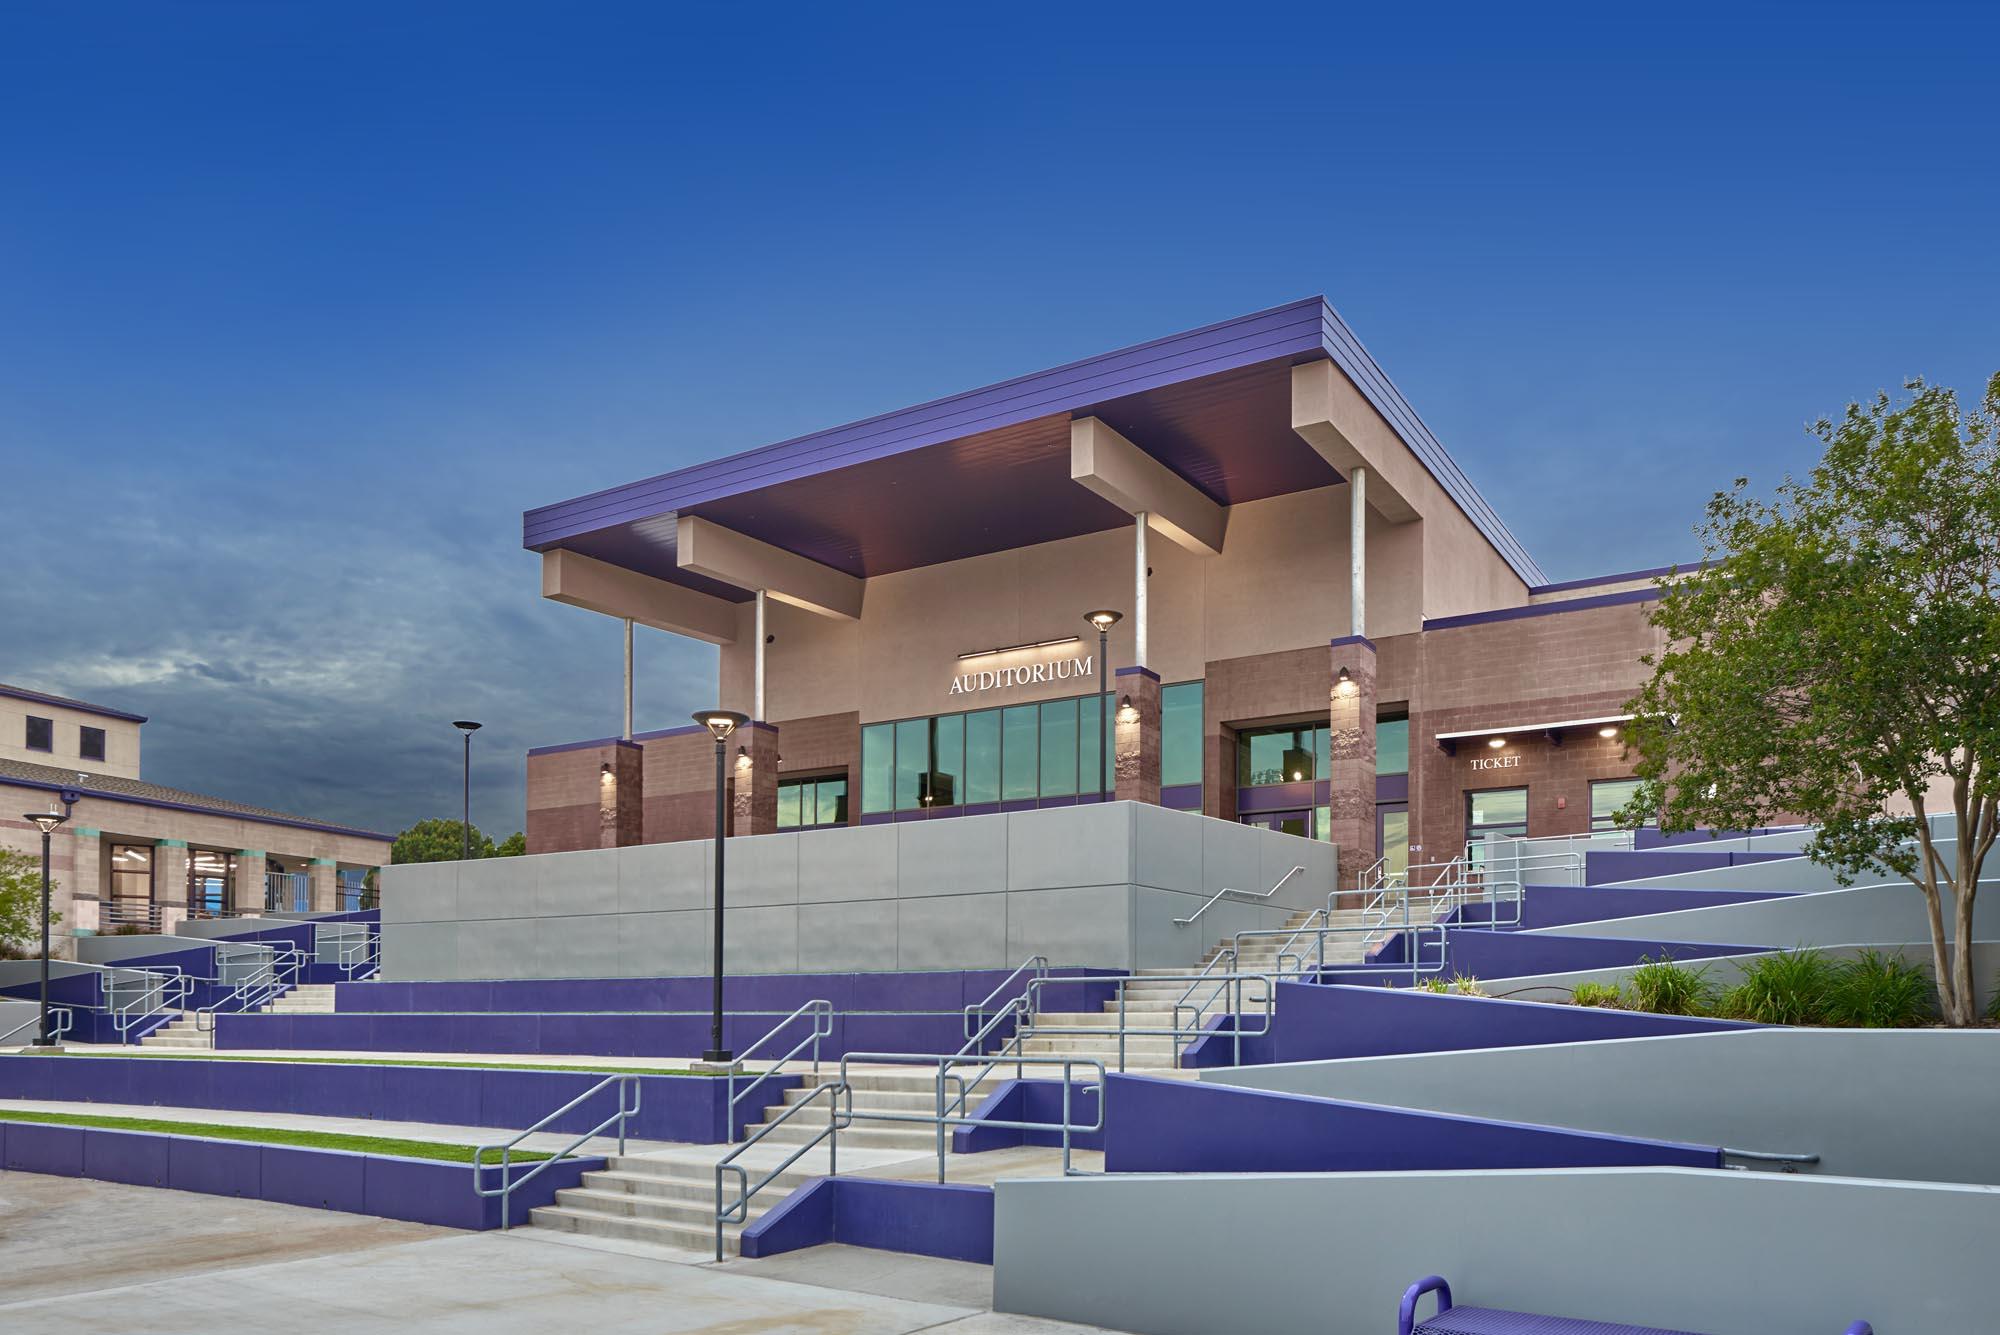 Rancho-Cucamonga-HS-Auditorium03.jpg